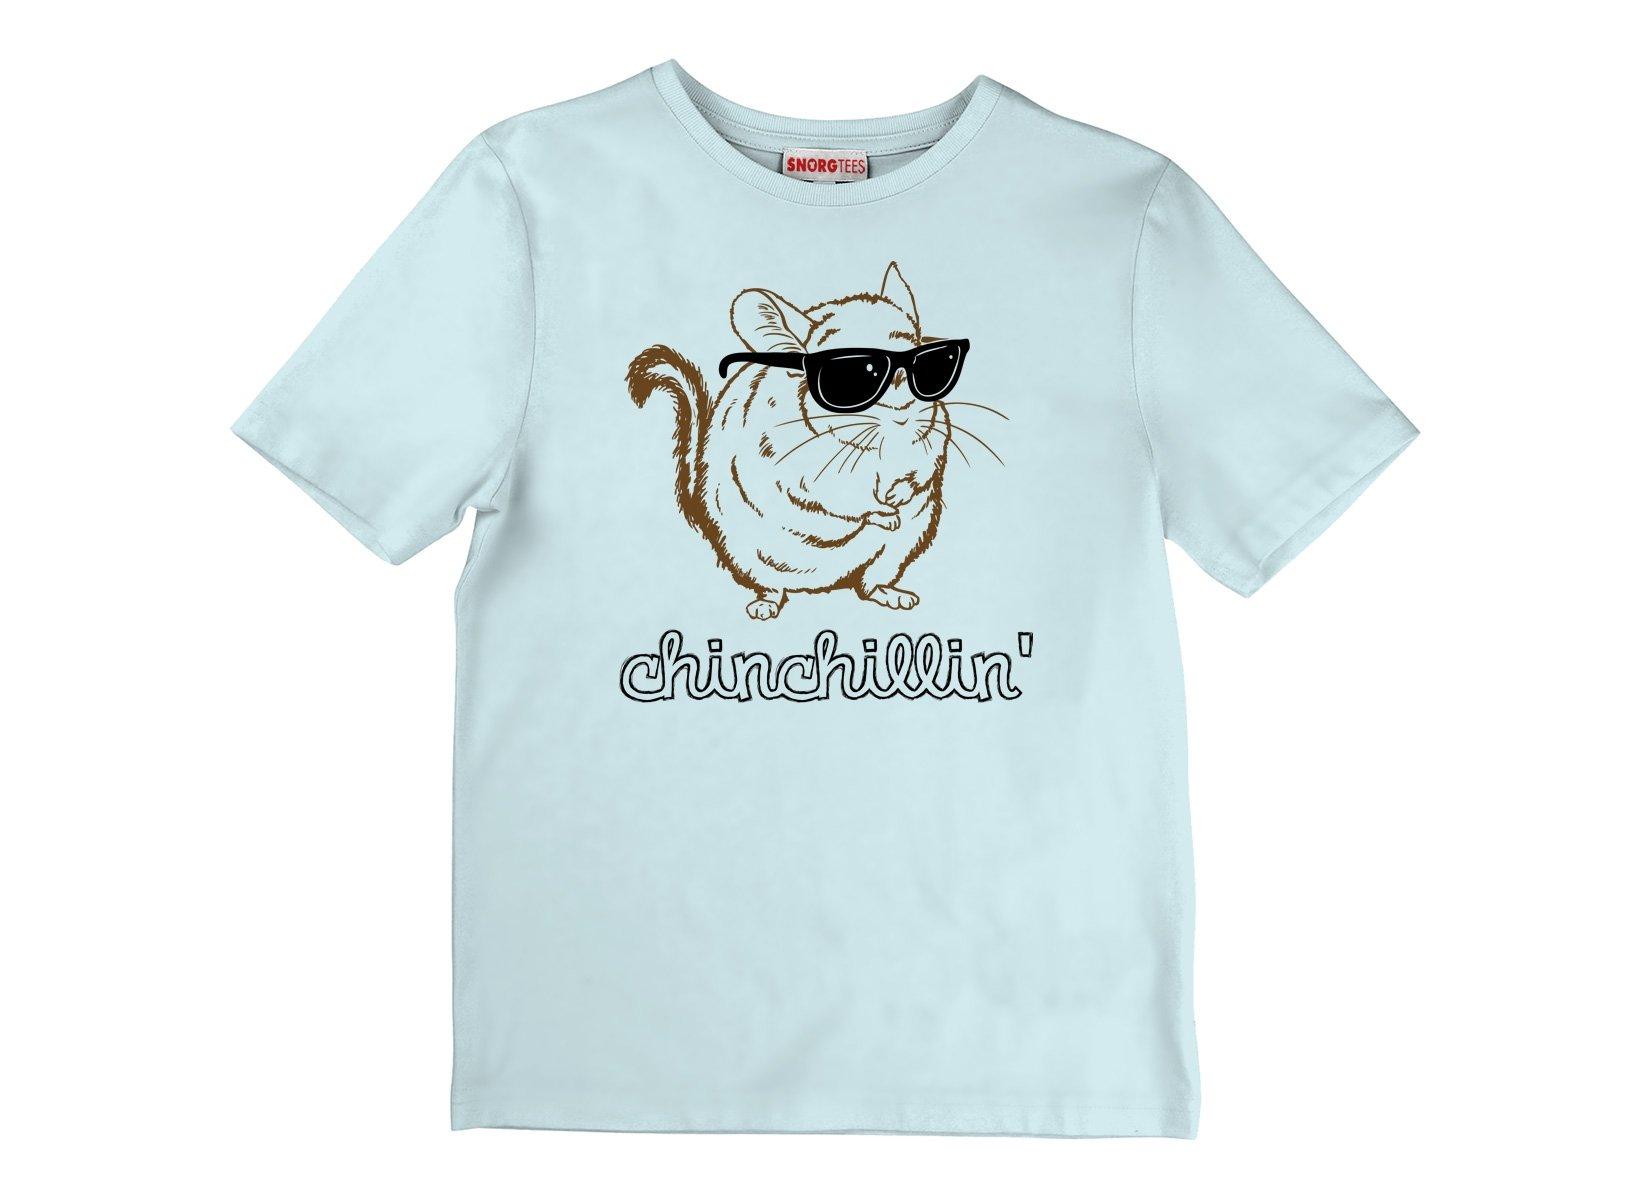 46a91579 Chinchillin T-Shirt | SnorgTees